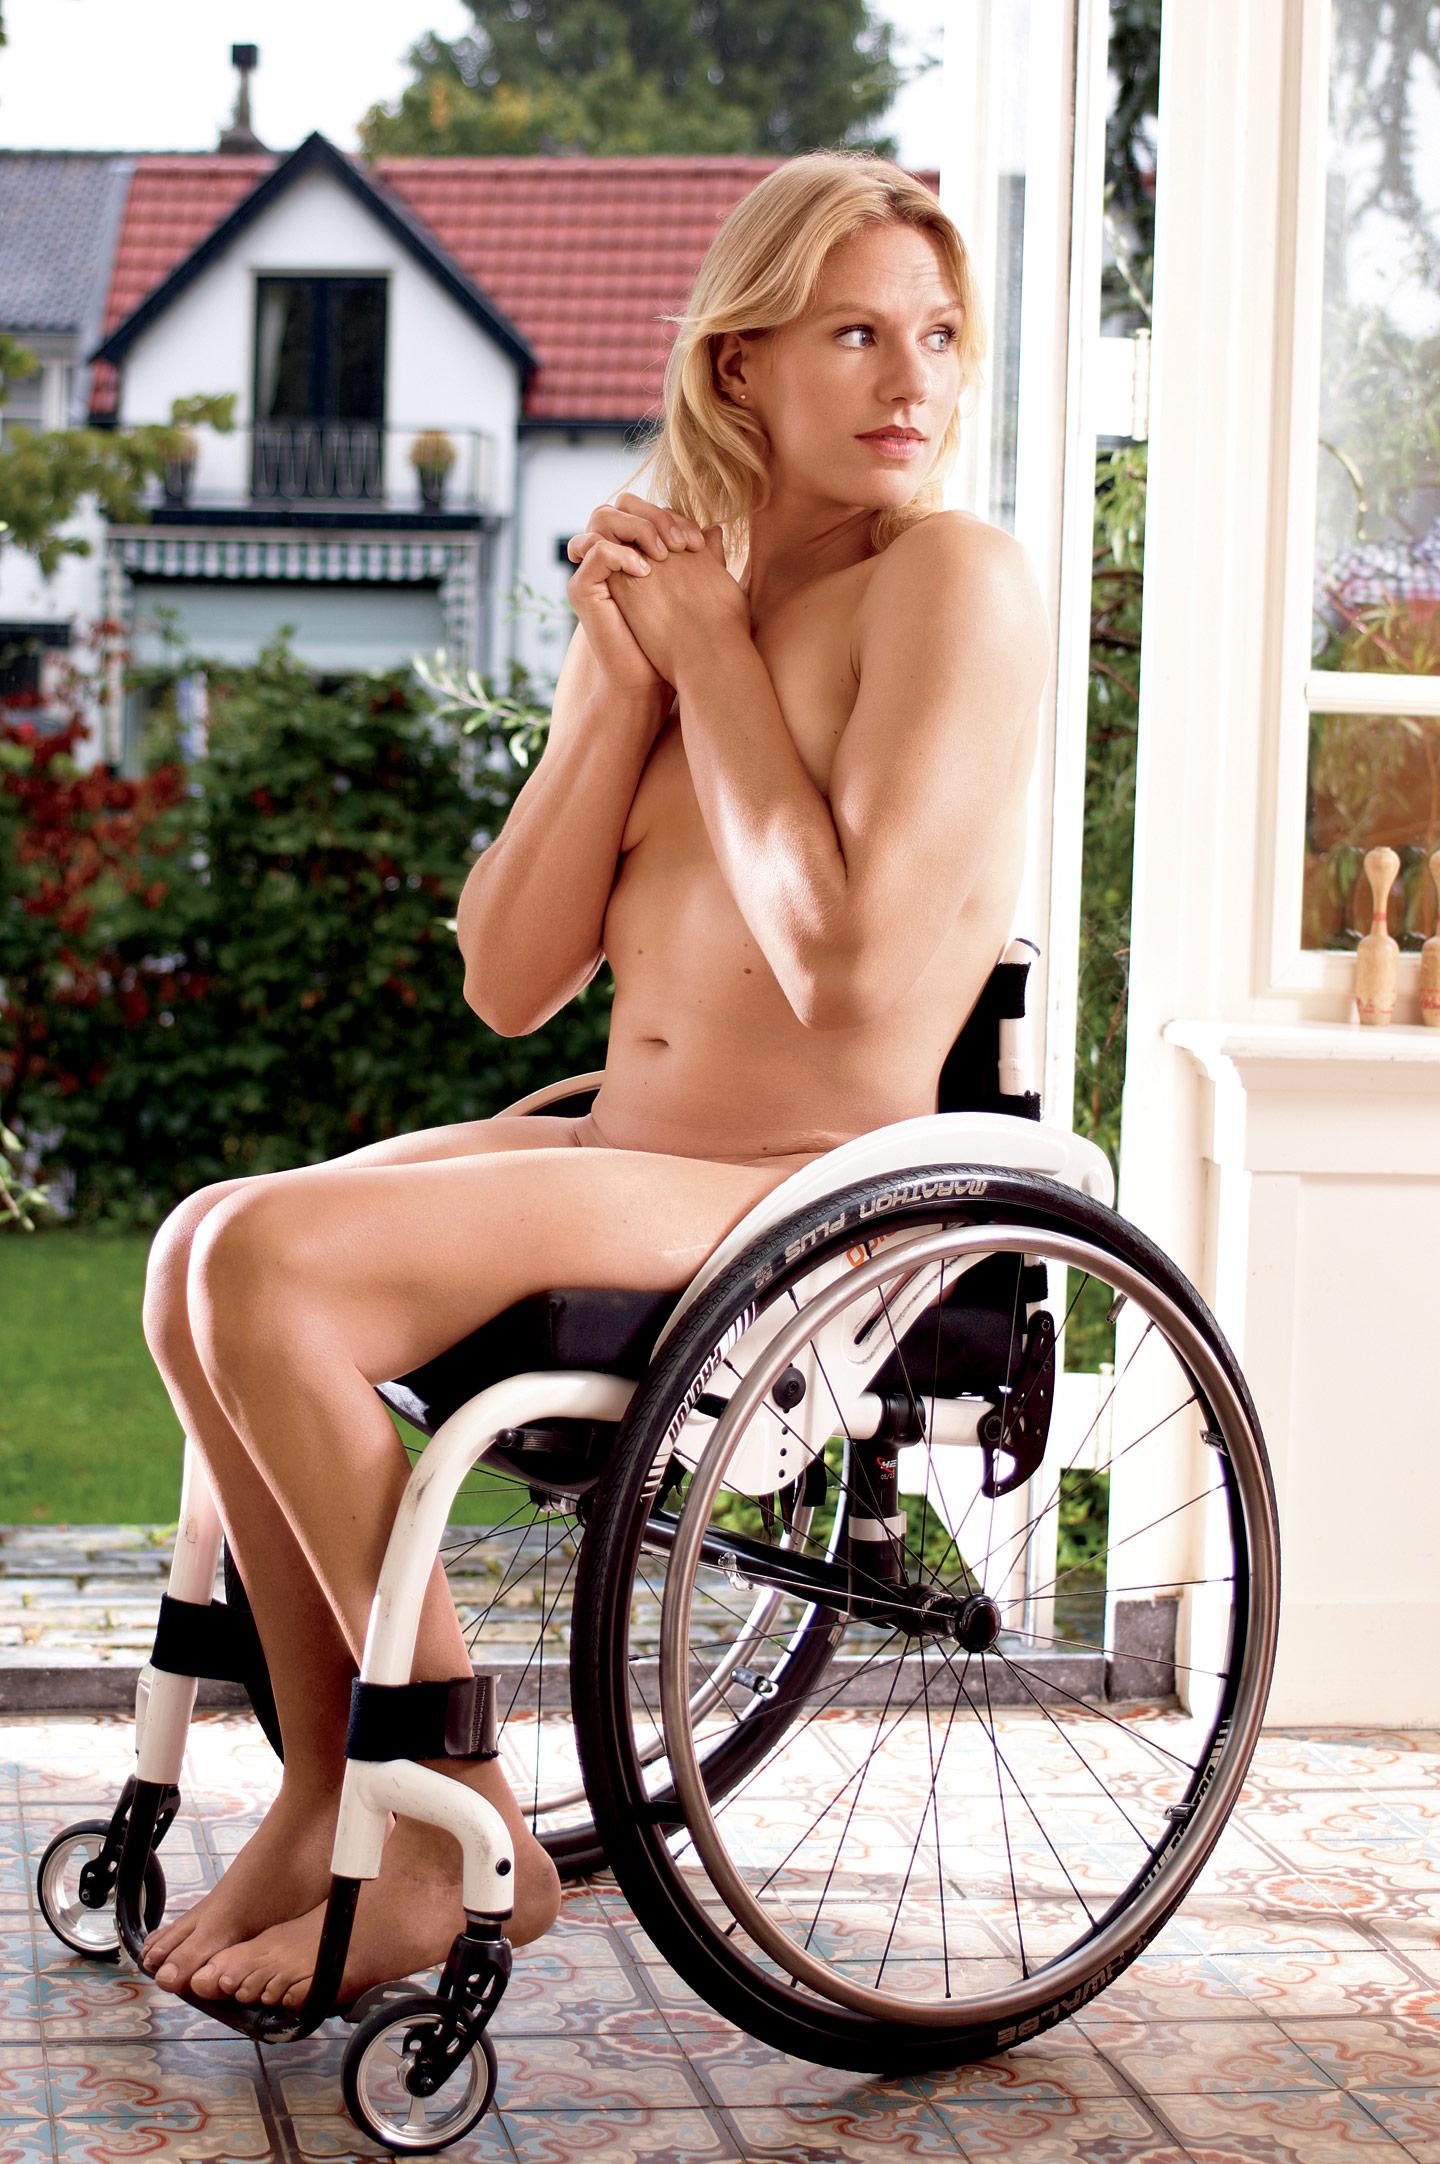 Esther Vergeer, ESPN Body Issue 2010, Bodies We Want, Esther Vergeer Nude,